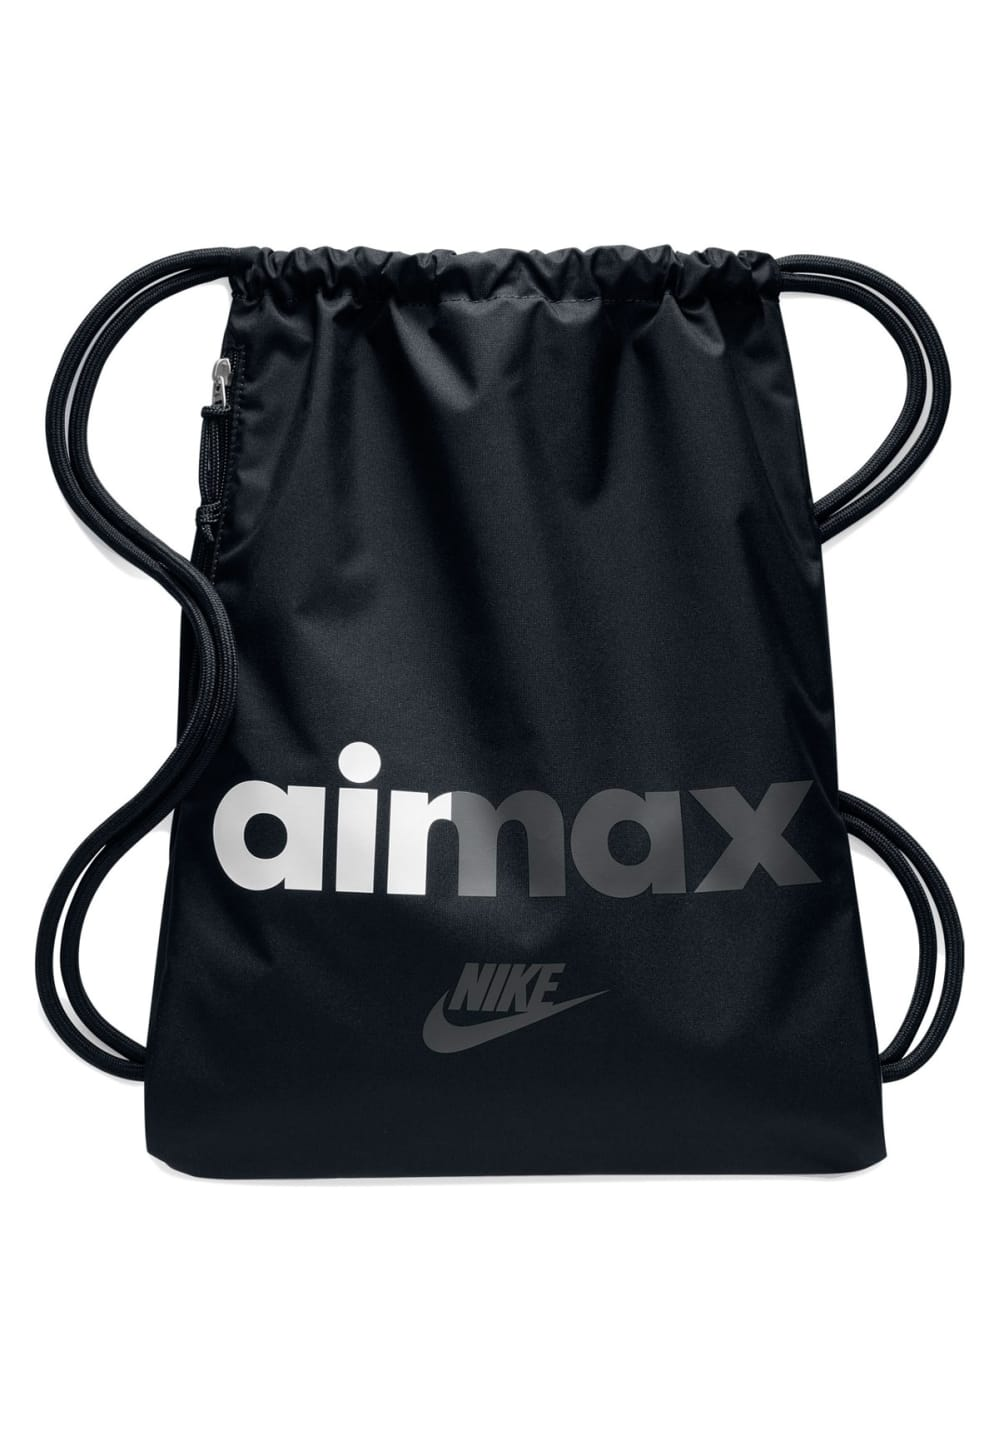 d394c9c68 Nike Heritage Gym Sack - Bags - Black | 21RUN